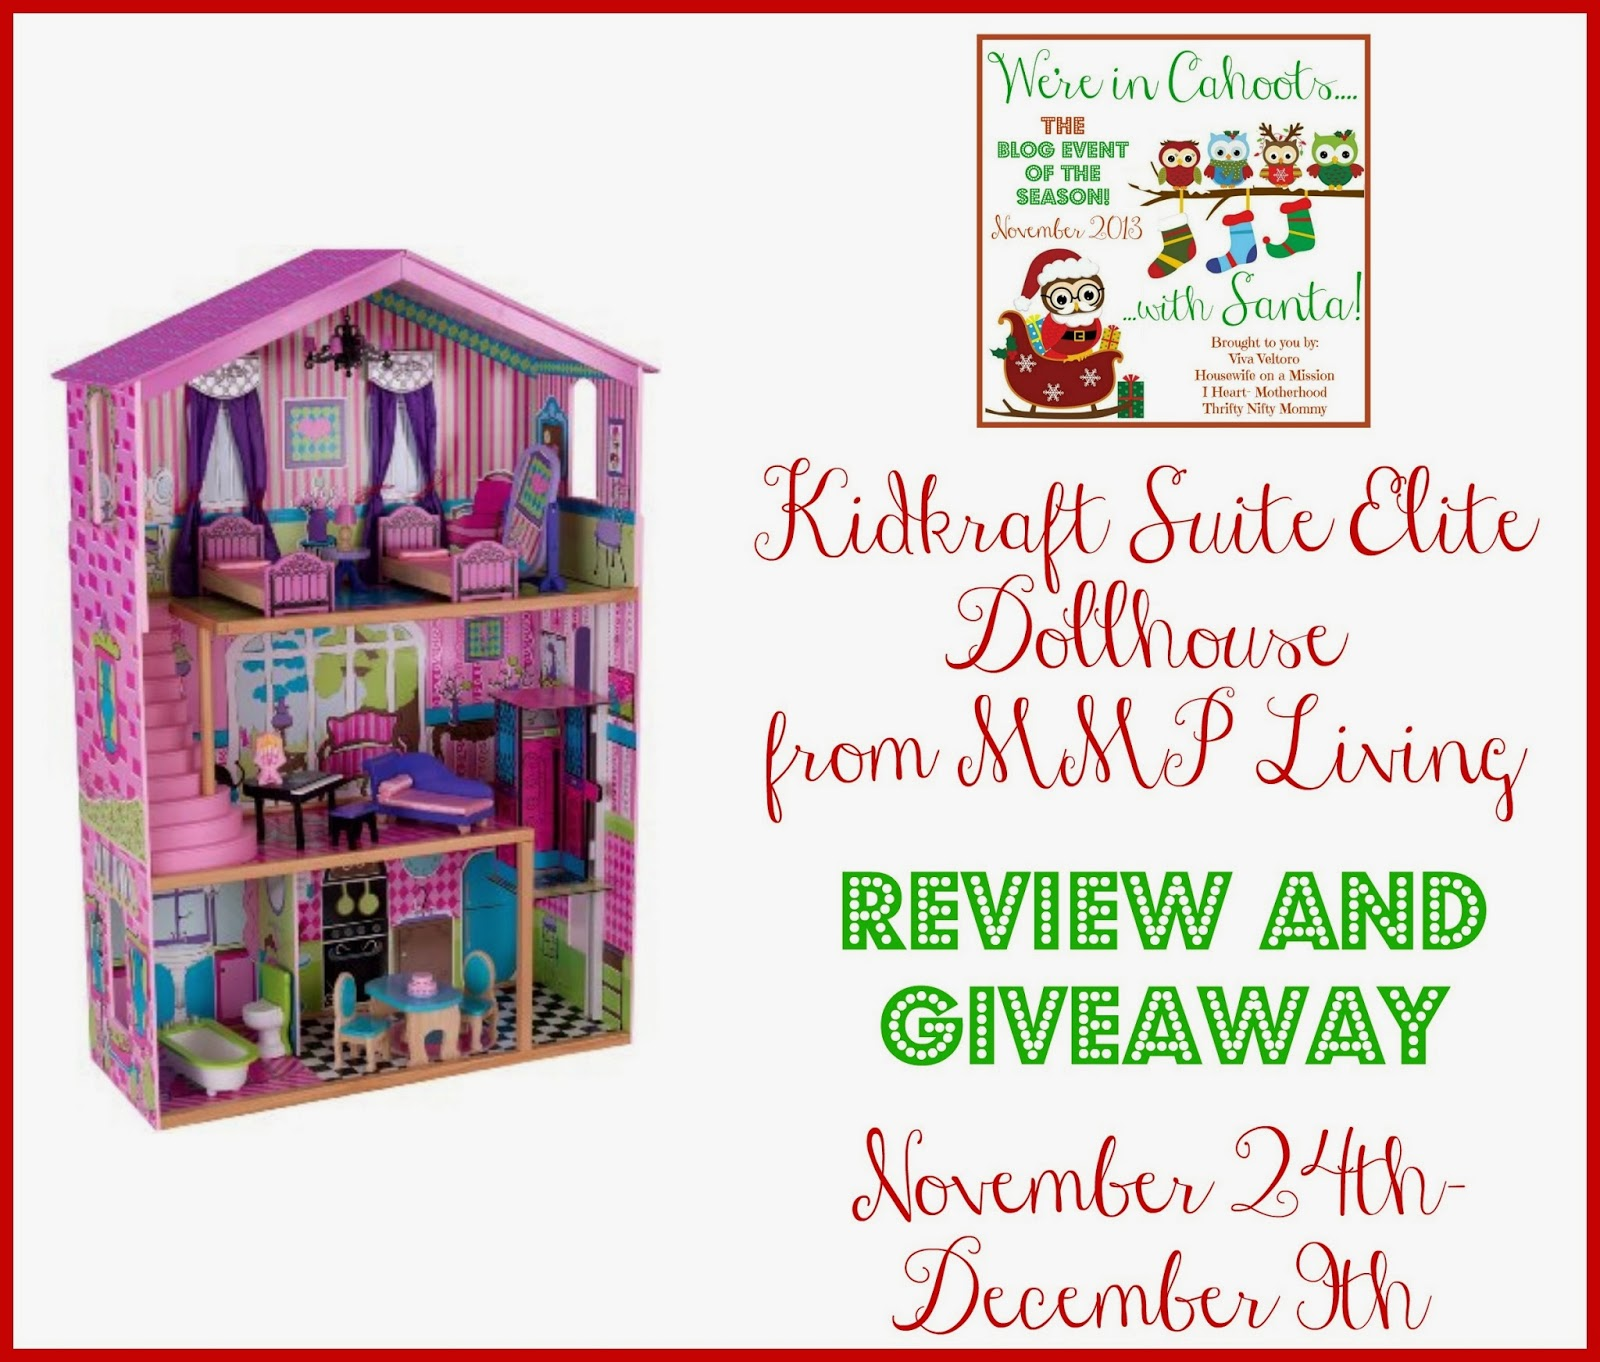 Kidkraft Suite Elite Mansion Dollhouse #Giveaway #InCahoots | Viva